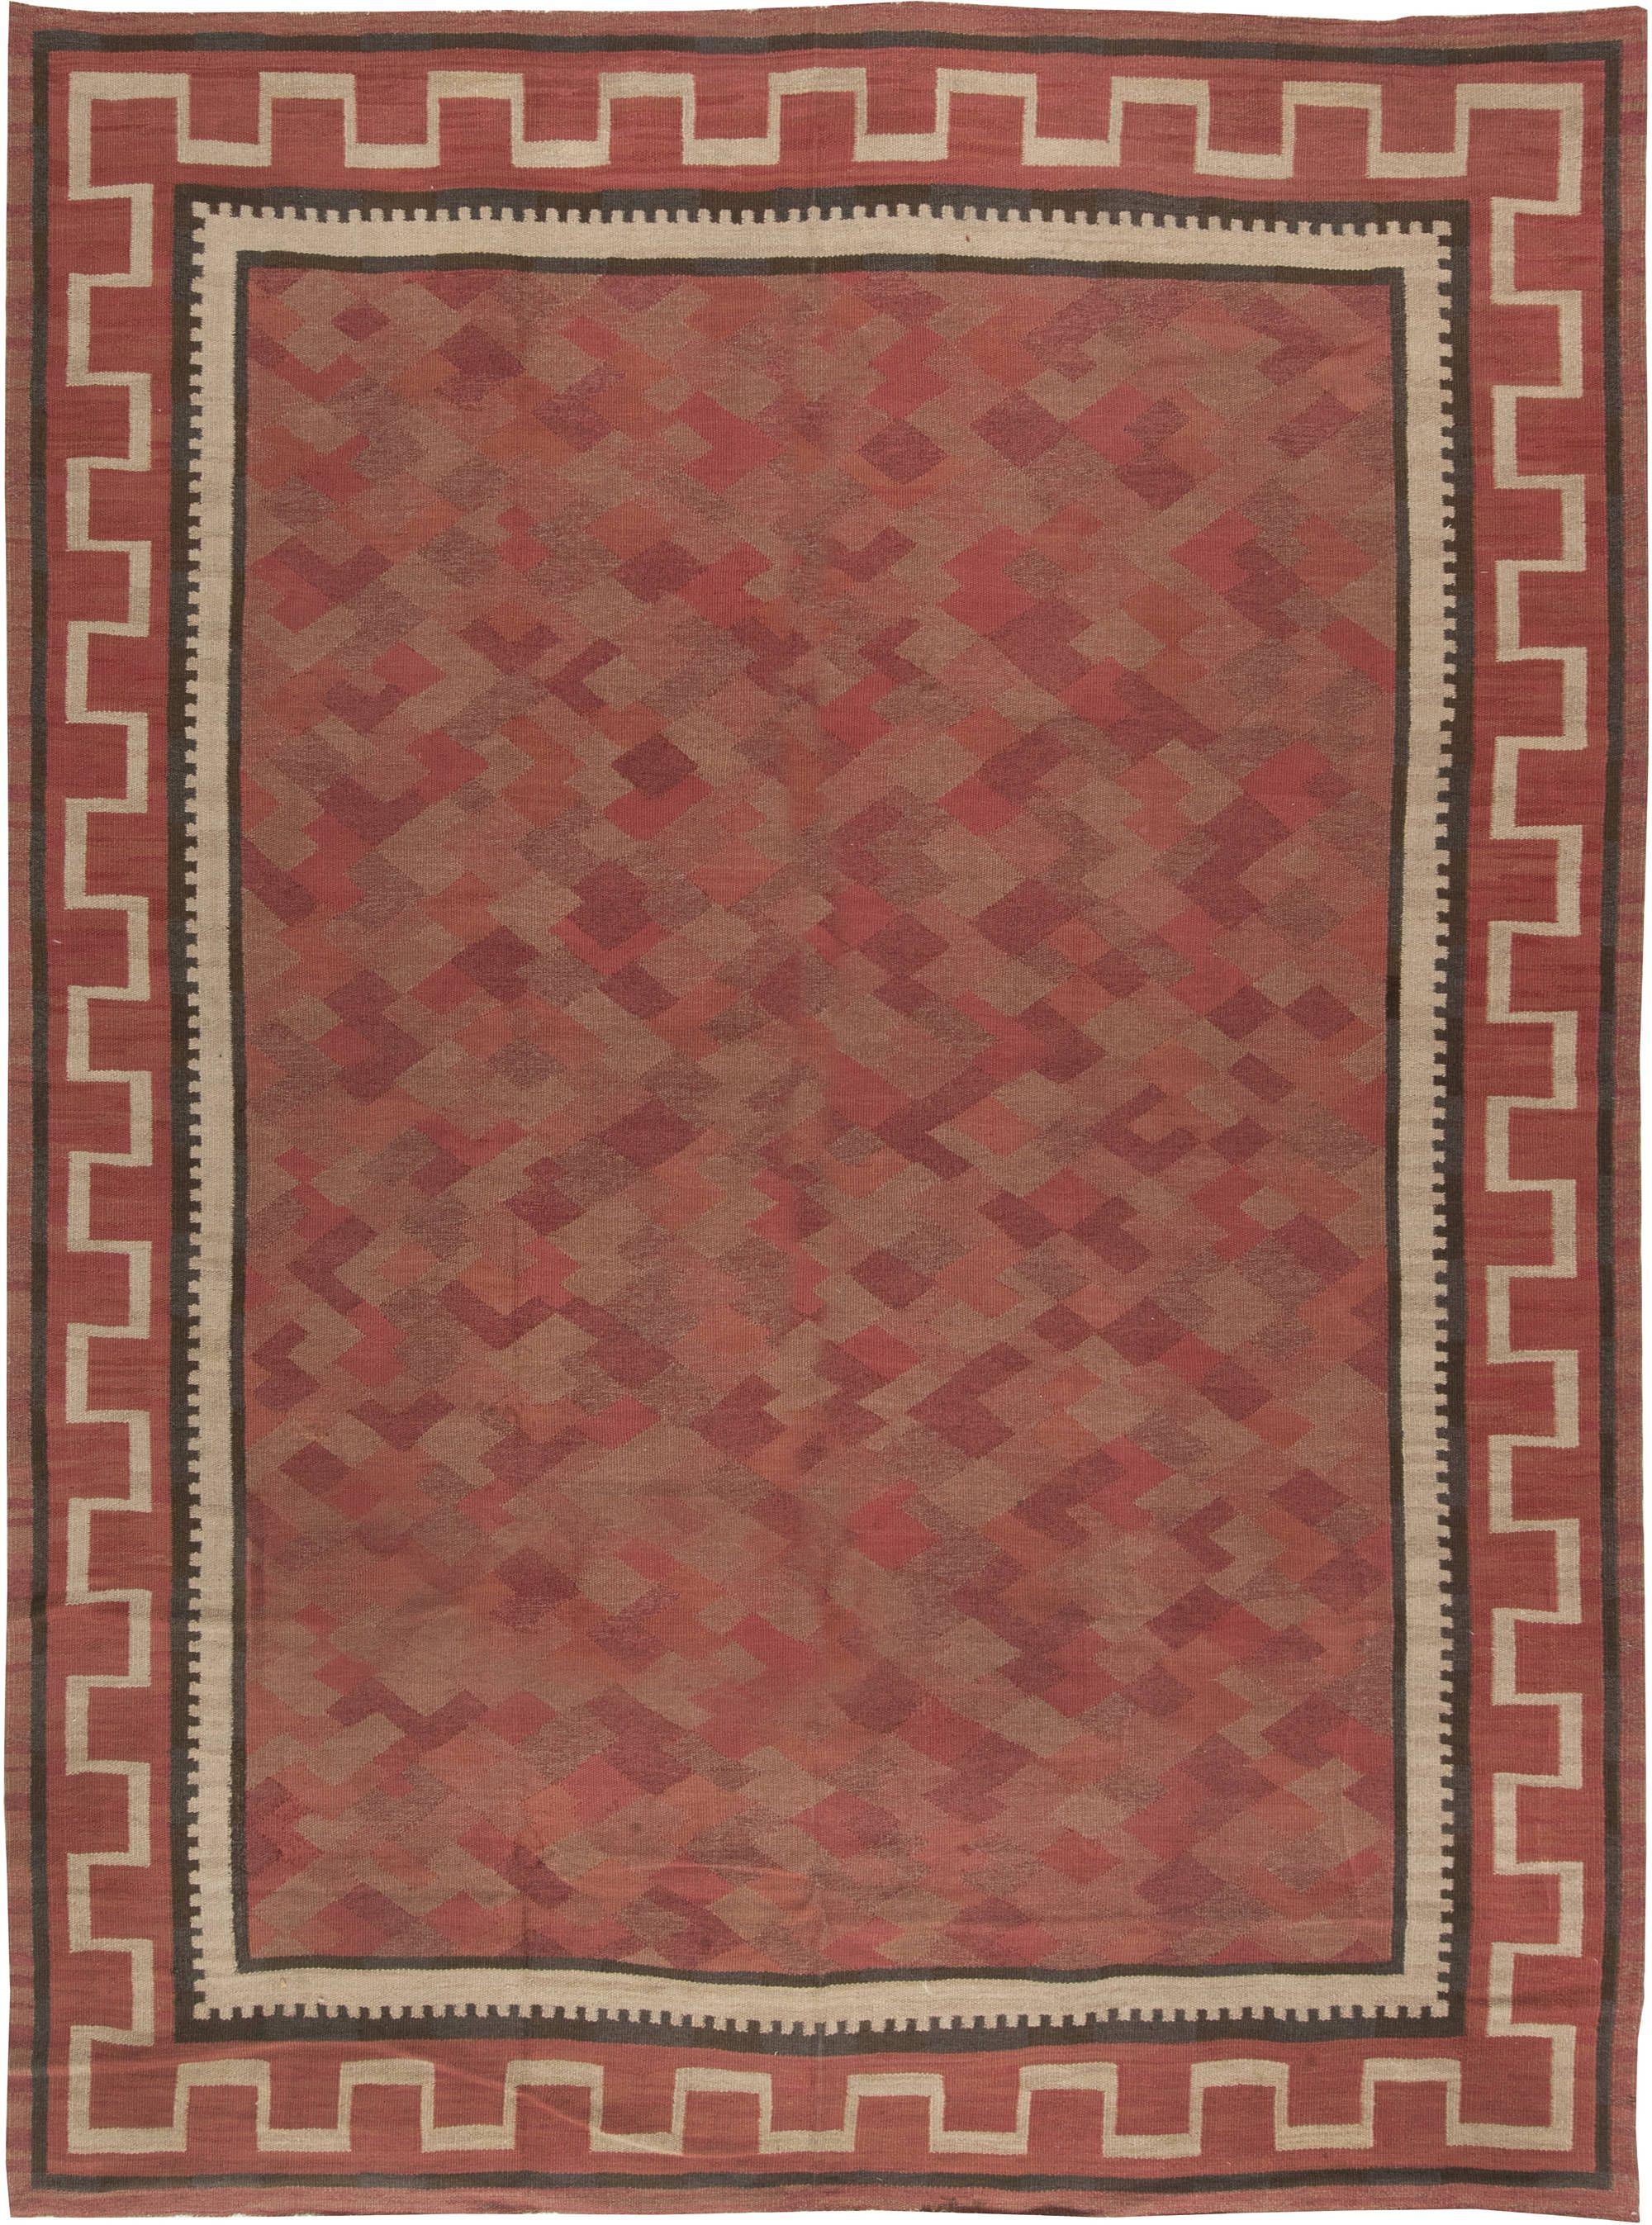 Swedish Midcentury Red Burgundy And Carmine Flat Woven Wool Rug Bb6474 By Dlb Scandinavian Rug Flat Weave Flat Weave Rug